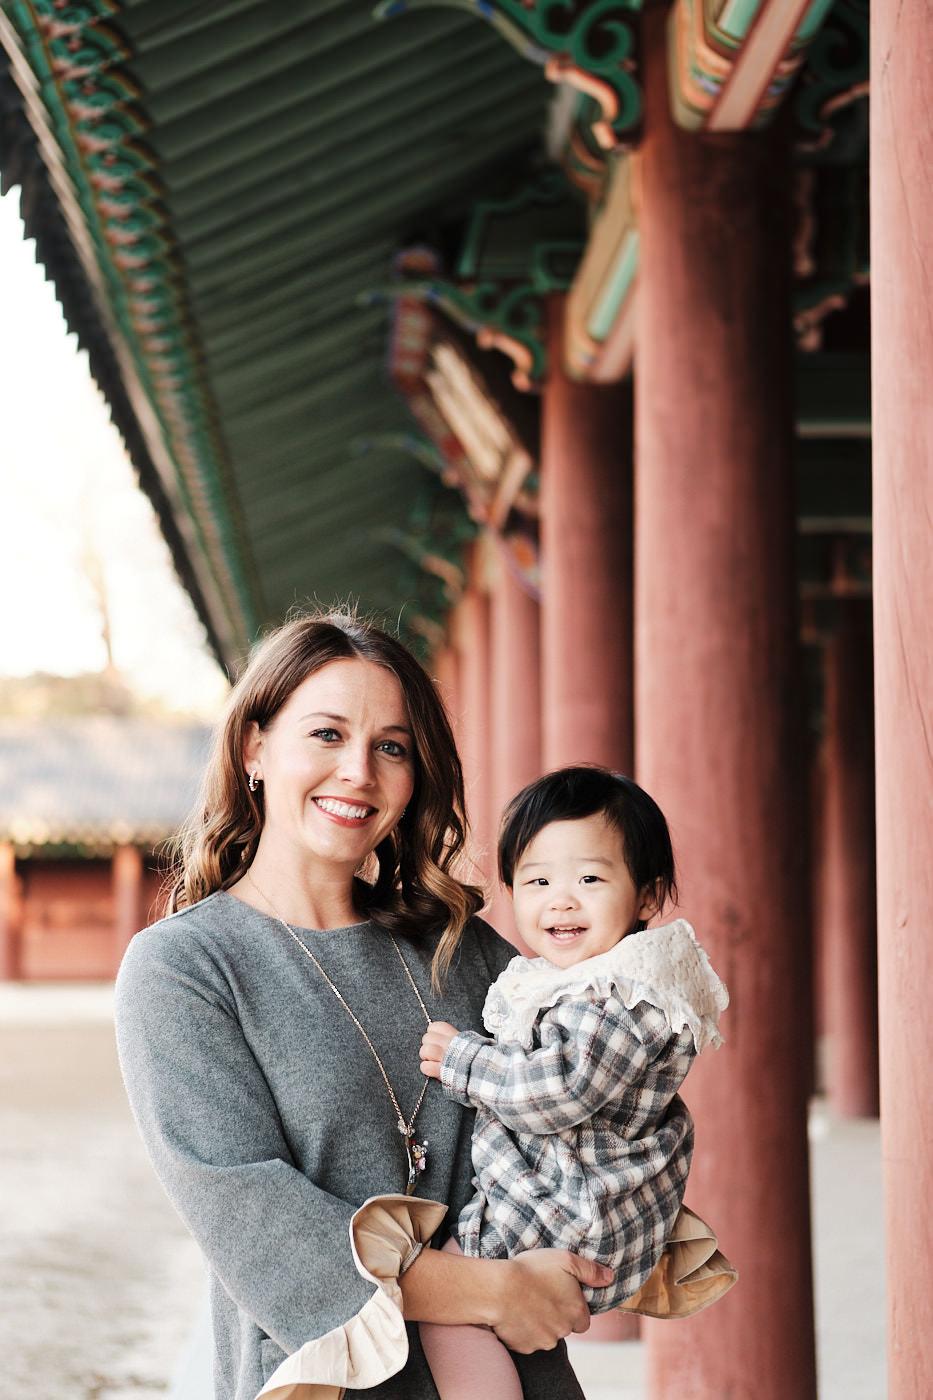 Venneman Family Photoshoot - Changdeokgung